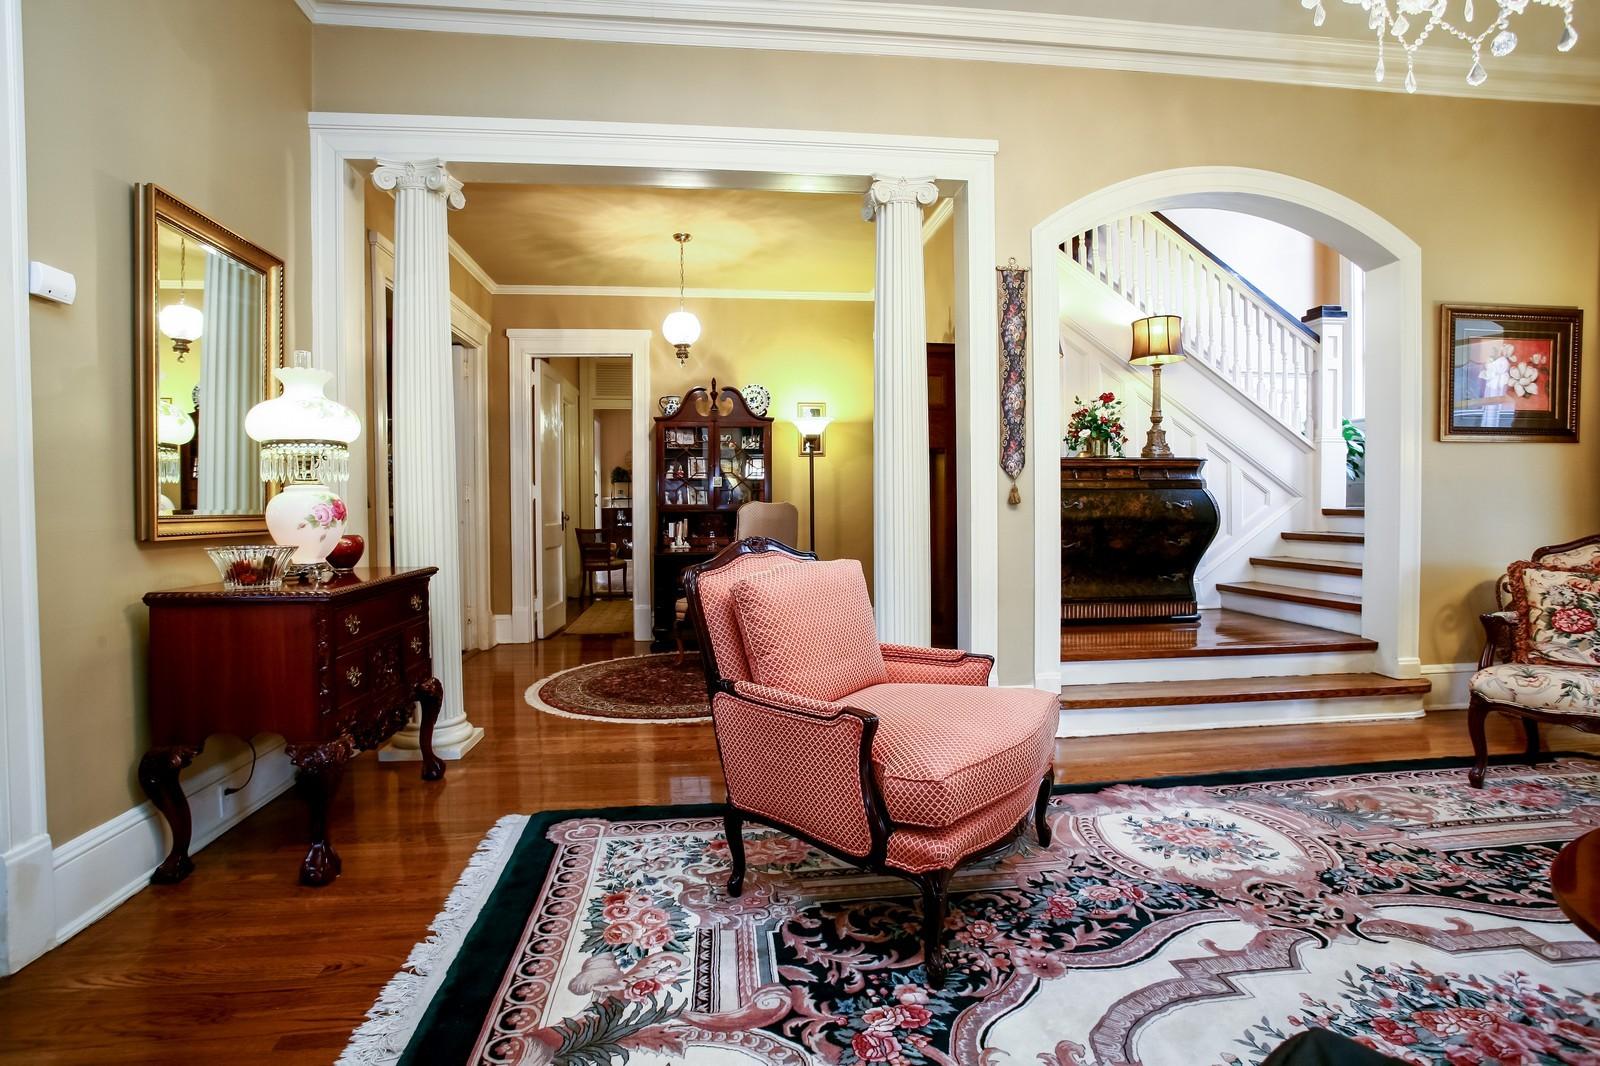 Real Estate Photography - 414 N 14th St, Lanett, AL, 36863 - Living Room